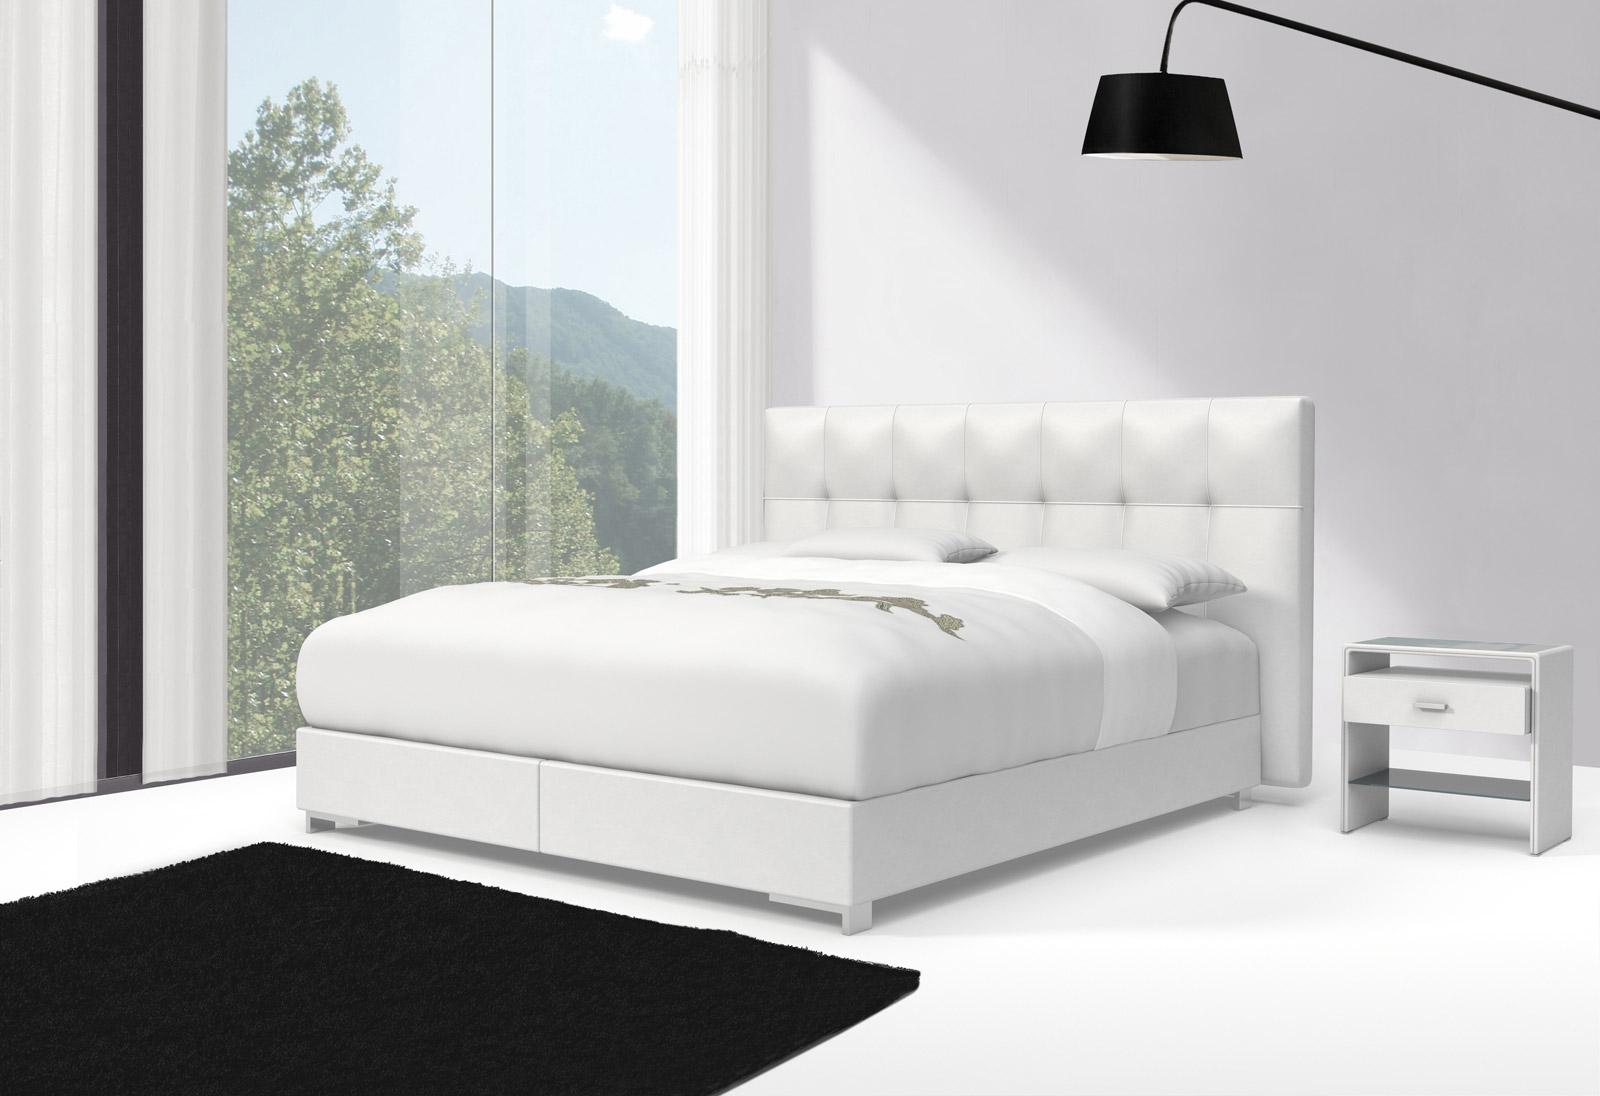 sam design boxspringbett 180 x 200 cm wei zarah toledo 27cm. Black Bedroom Furniture Sets. Home Design Ideas